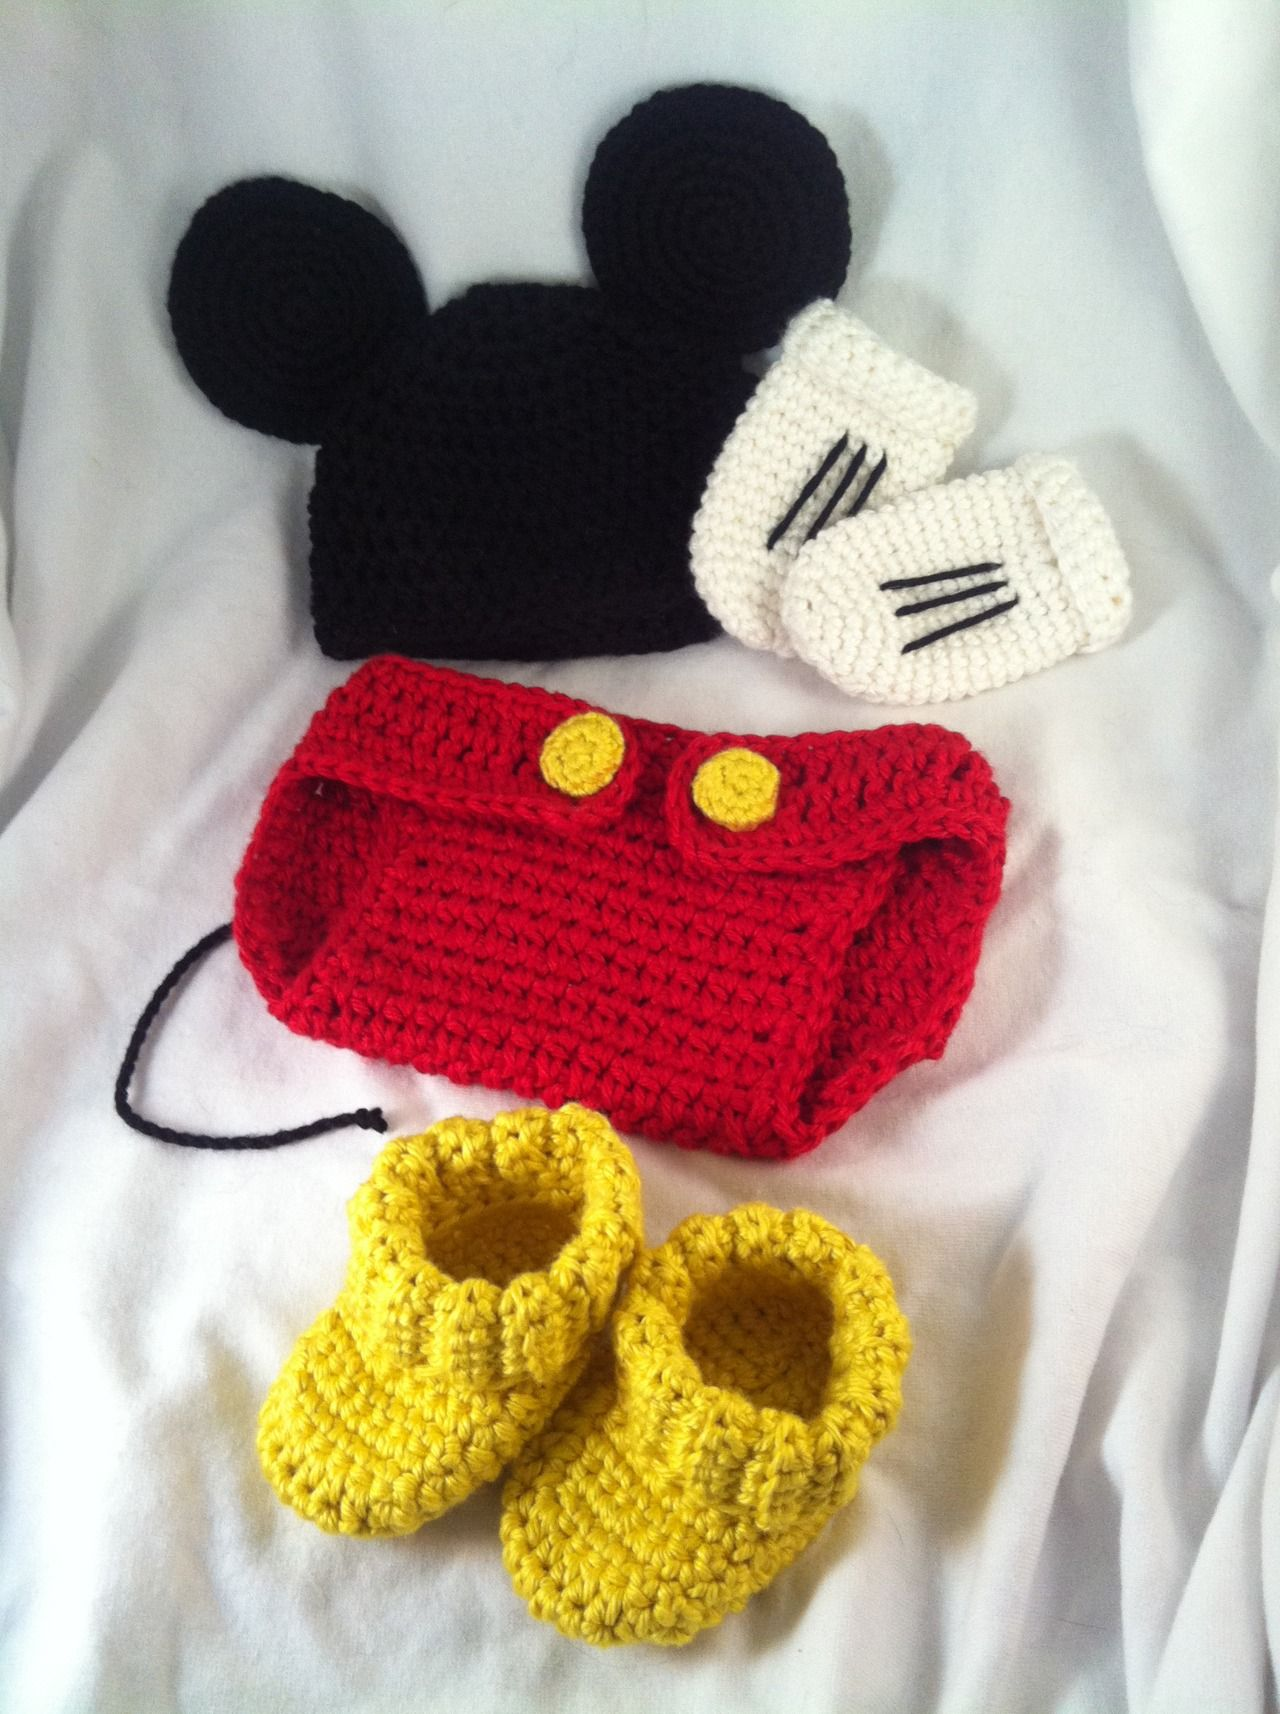 Conjunto Disfraz Traje Bebe Niño Niña Hembra Varon Tejido - Bs. Disfraz de  Mikey Mouse en ganchillo (Melonk 3d9a7bad98c